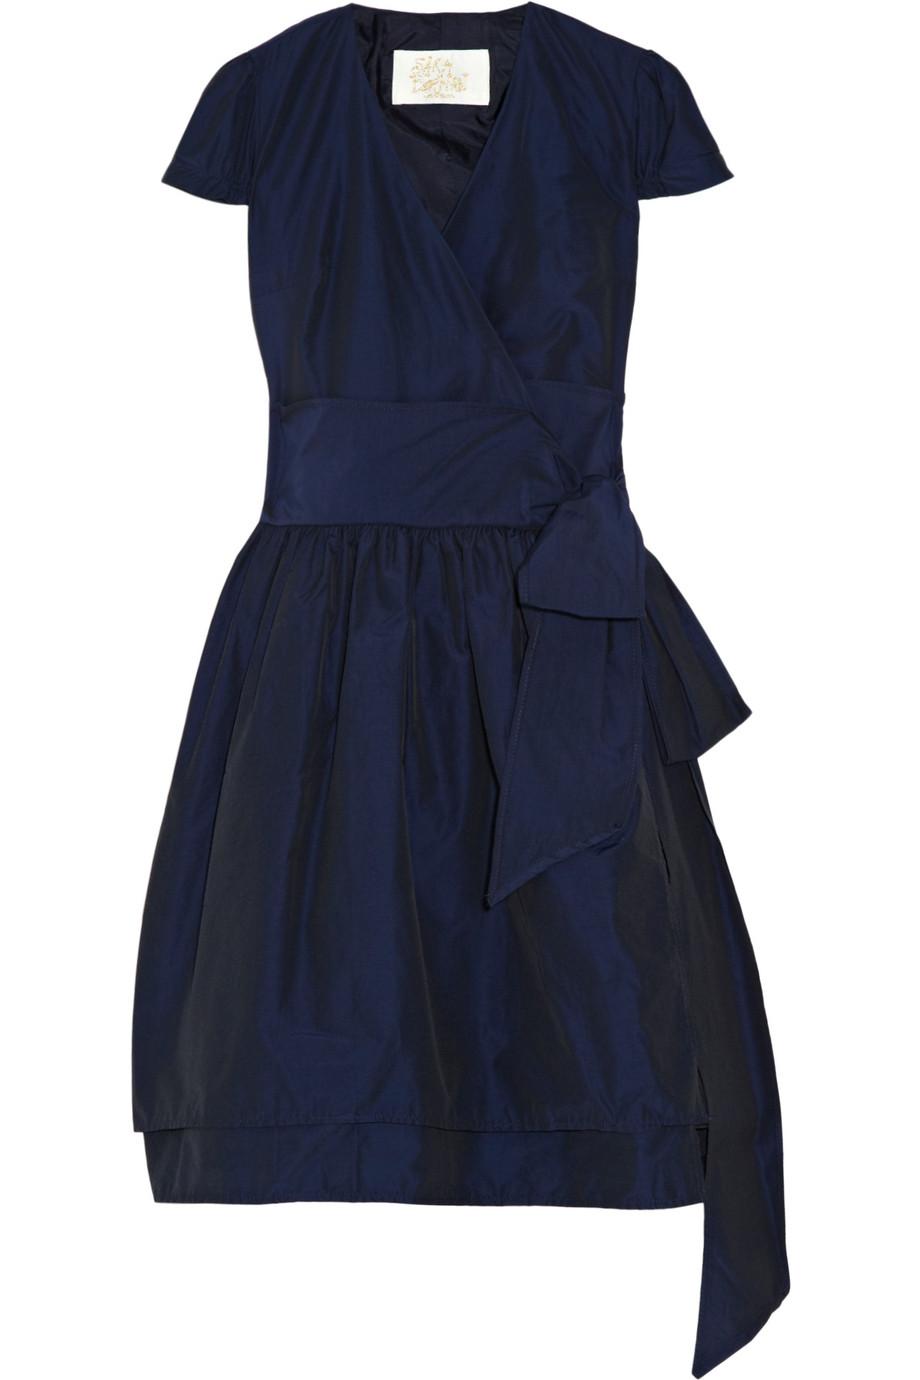 77974764cf7a Lyst - Sara Berman Gathered Woven Wrap Dress in Blue